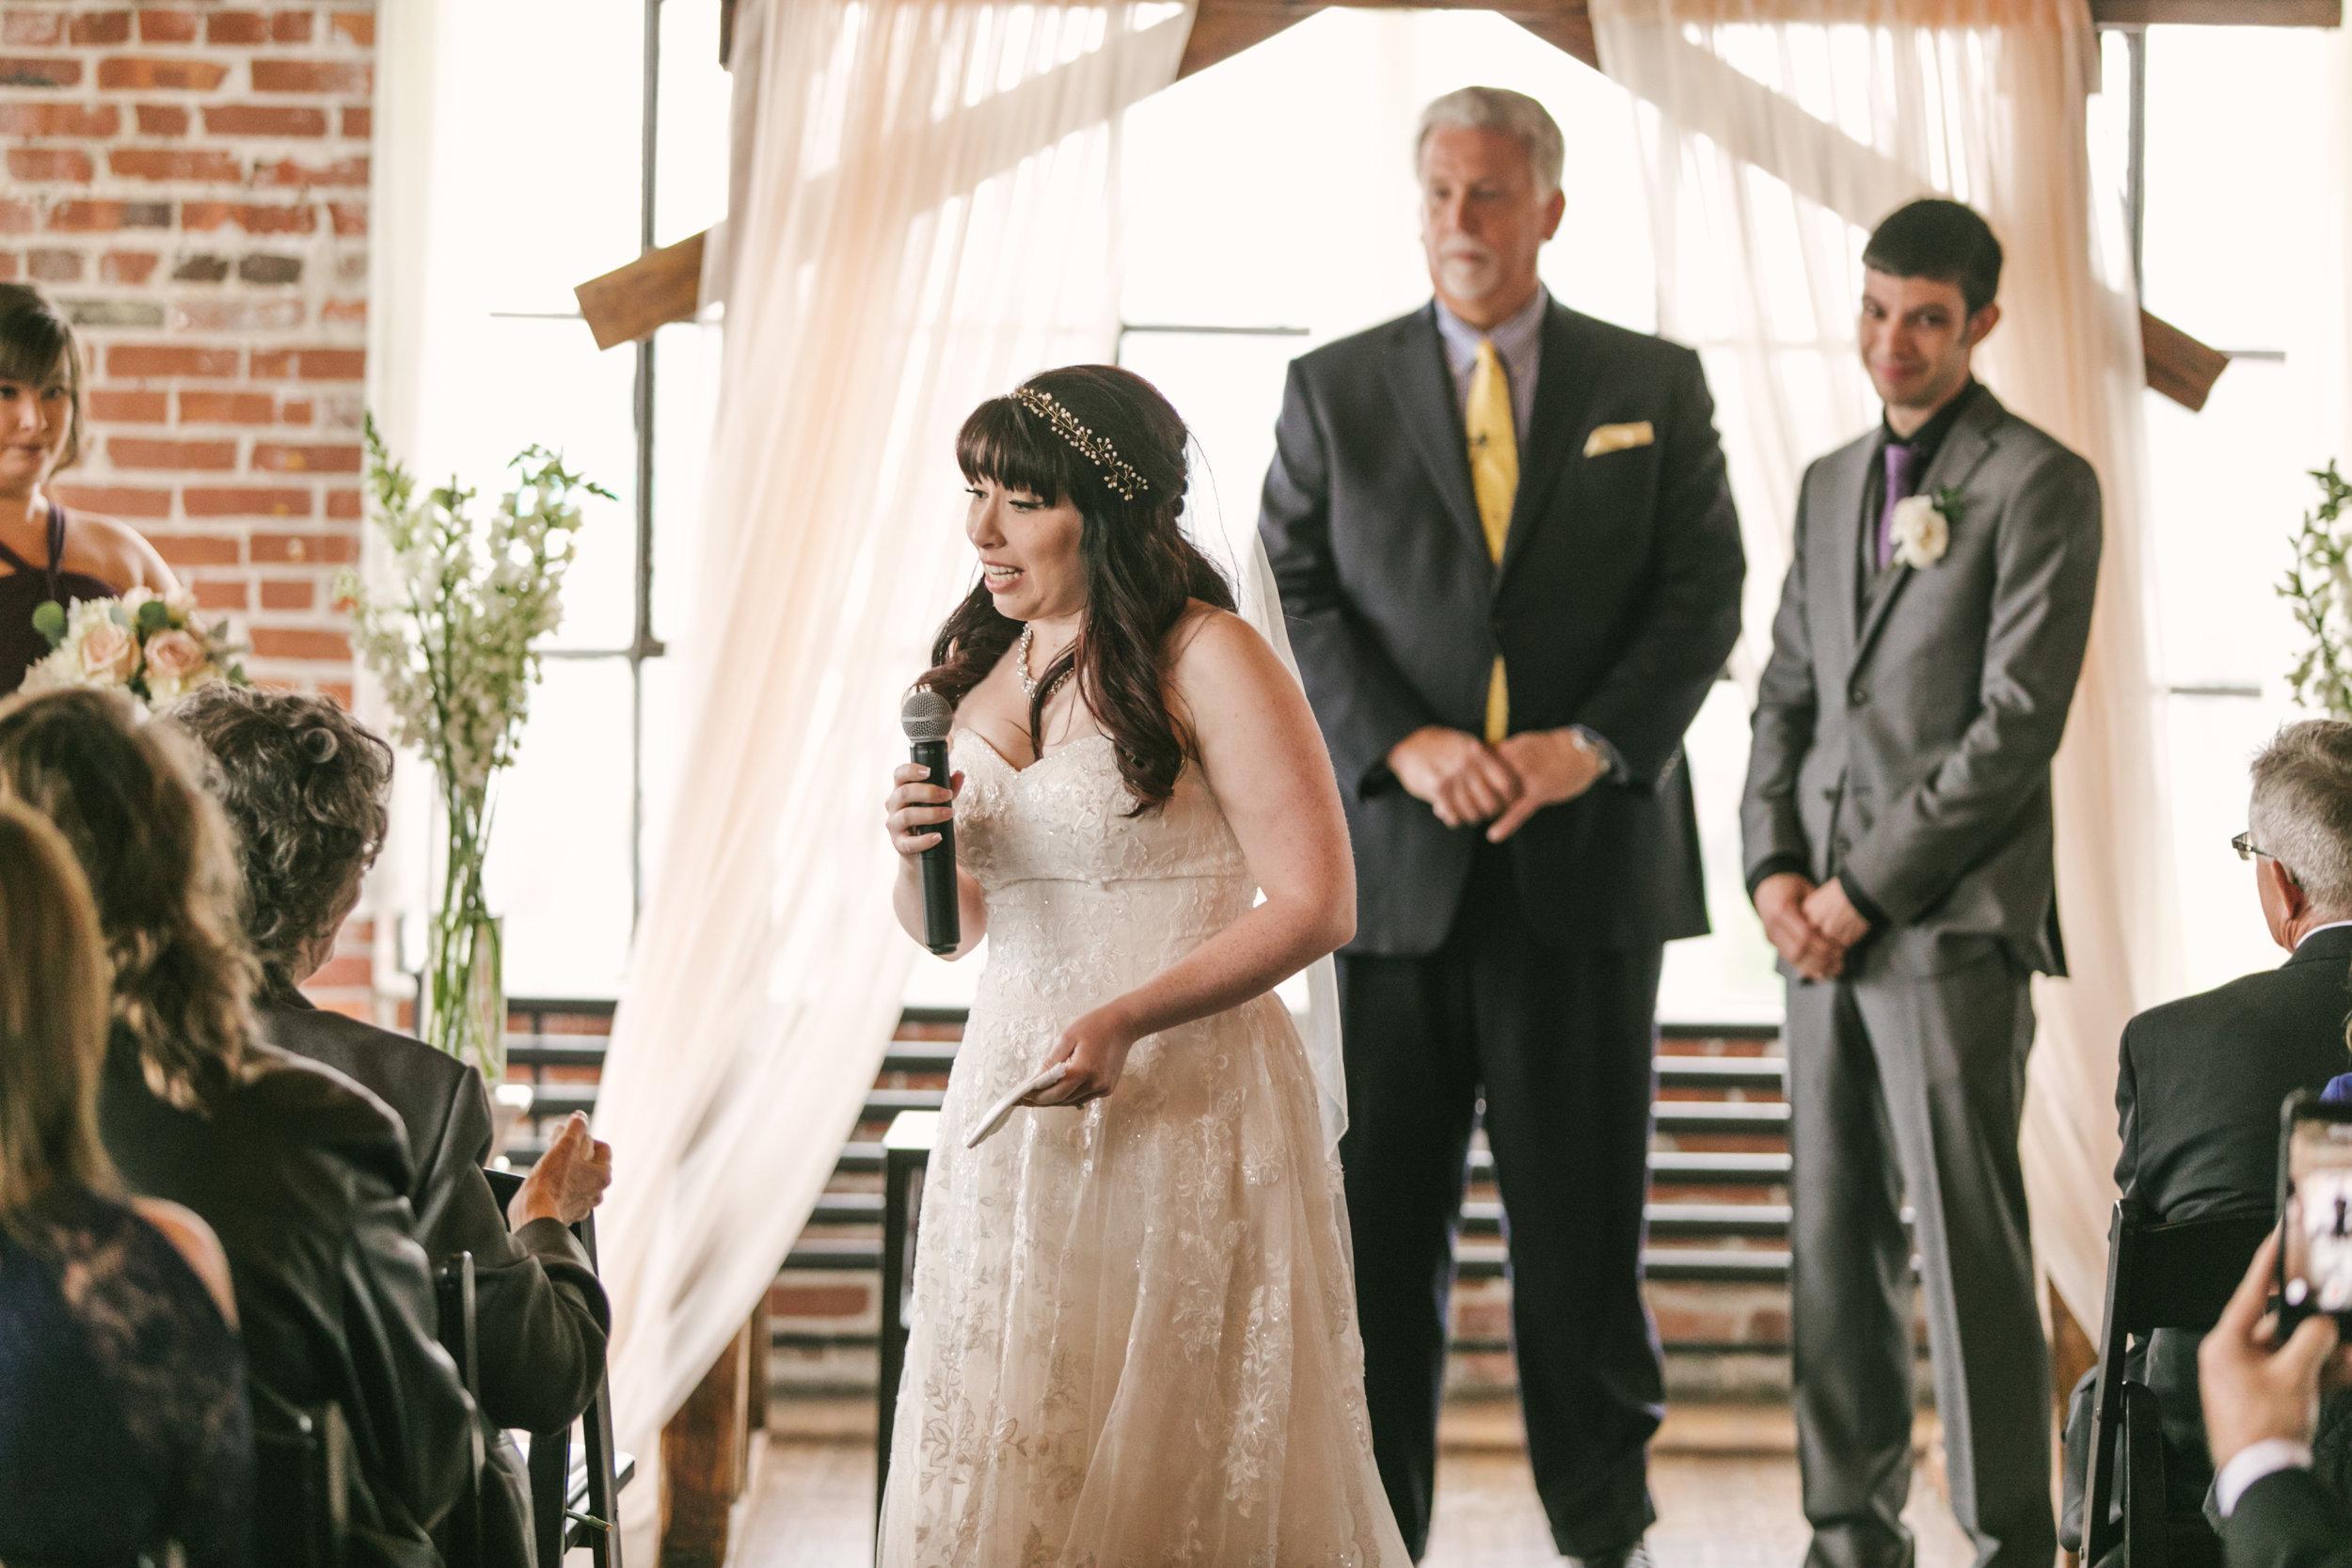 565_Colin+Jessica_Wedding.jpg